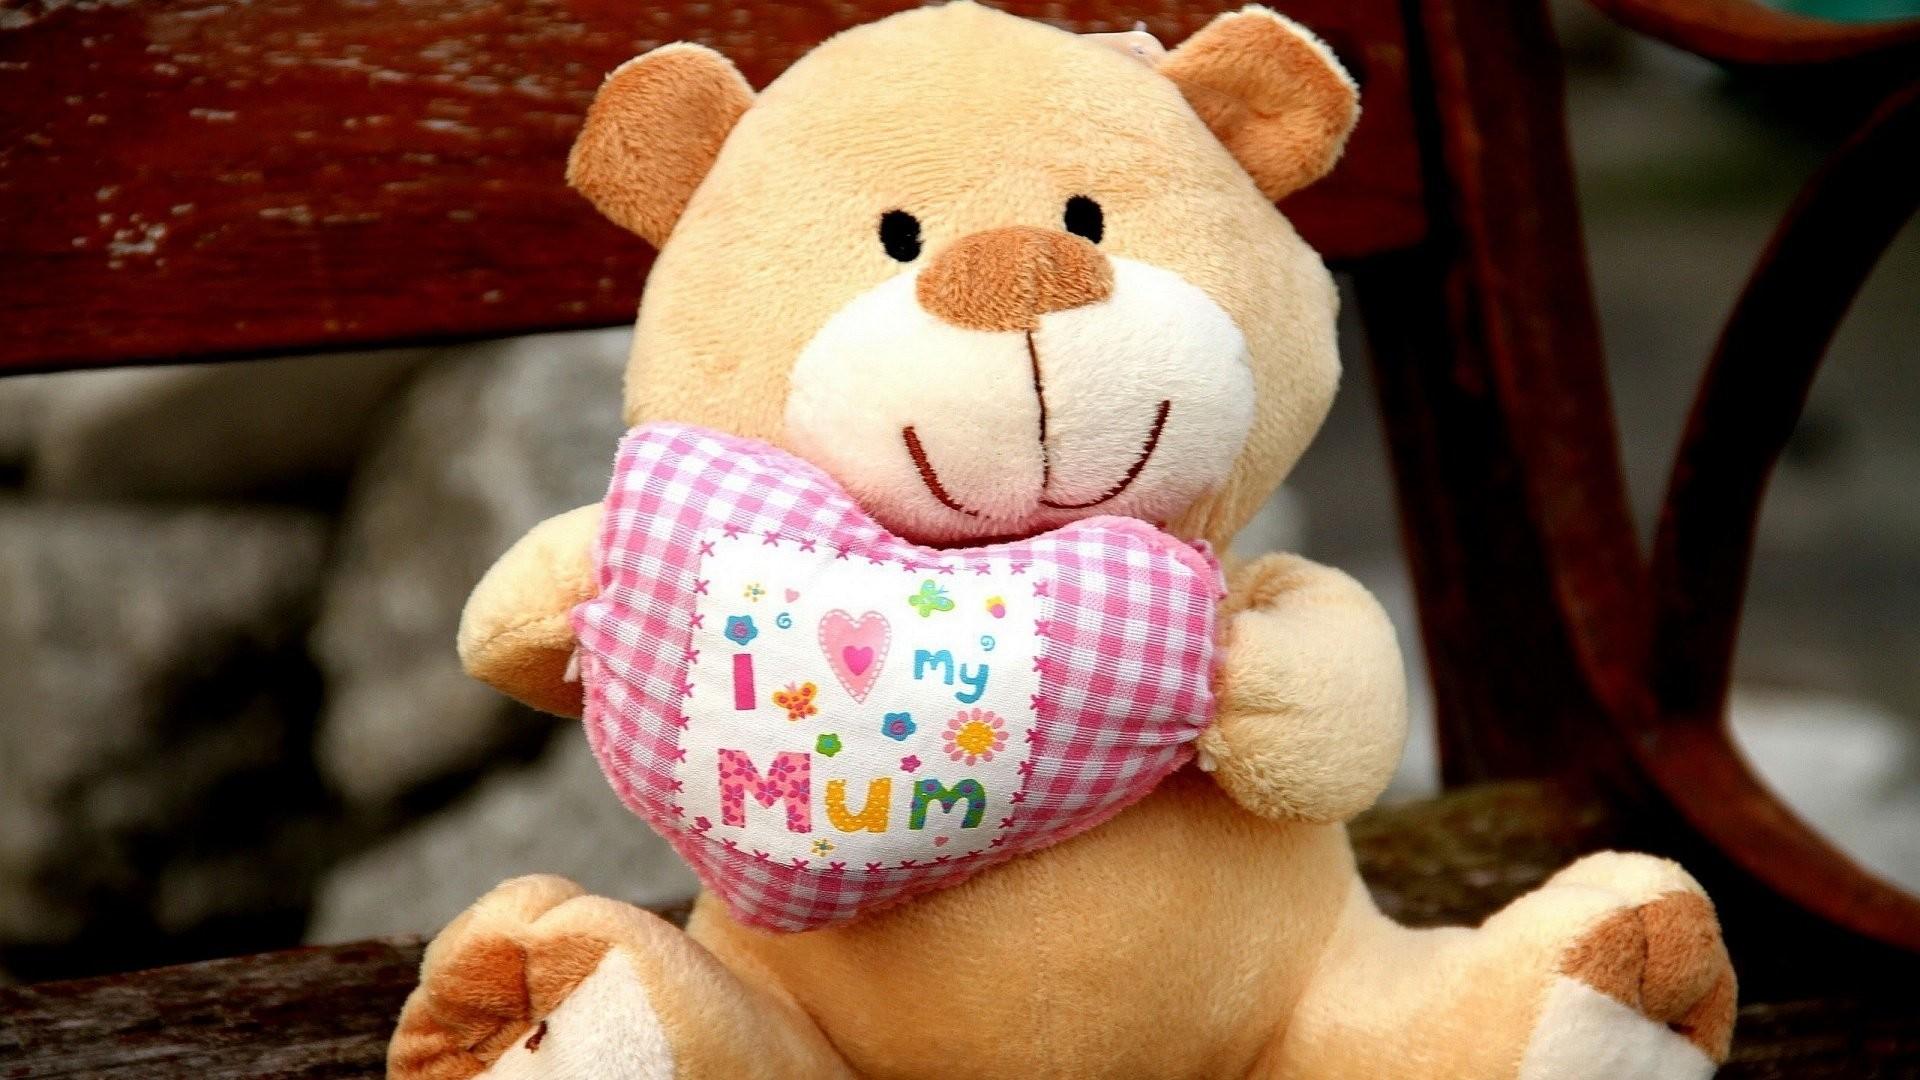 I Love My Mom 463401 …